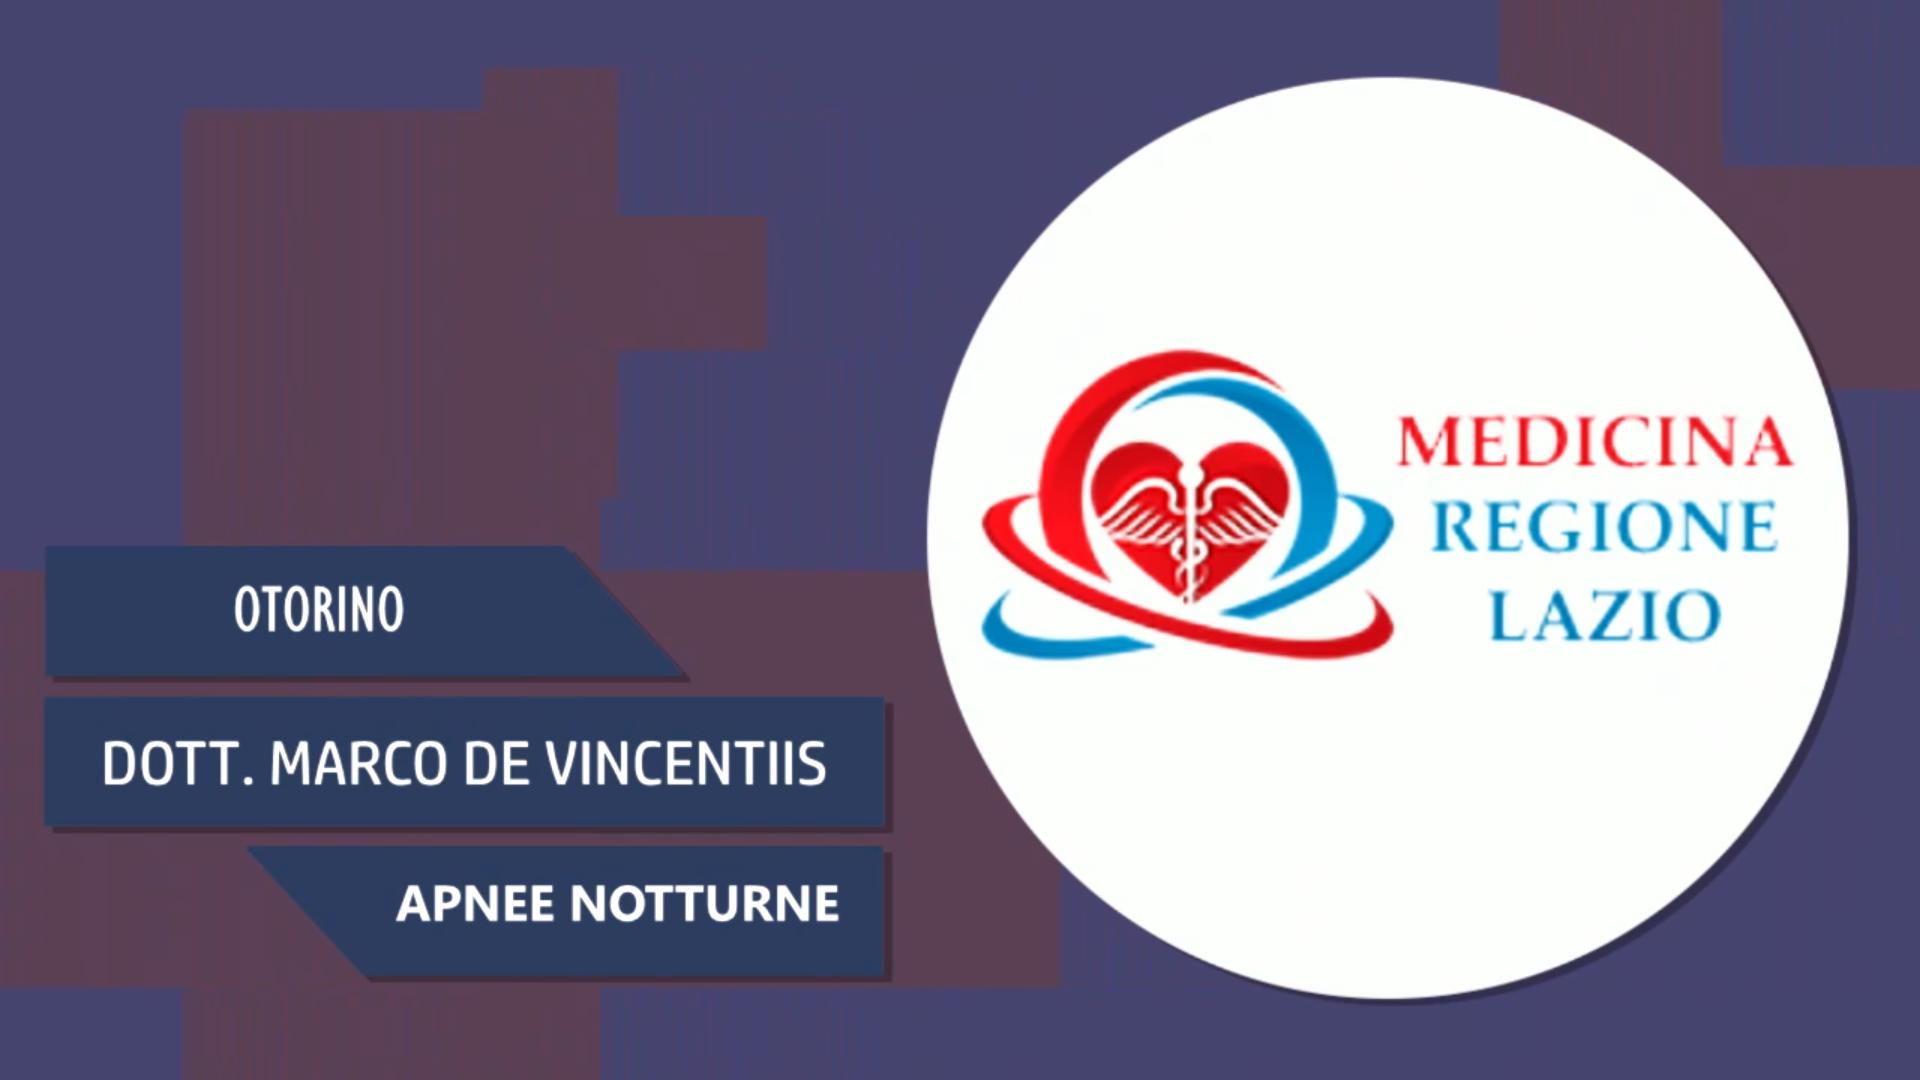 Intervista al Dott. Marco De Vincentiis – Apnee Notturne